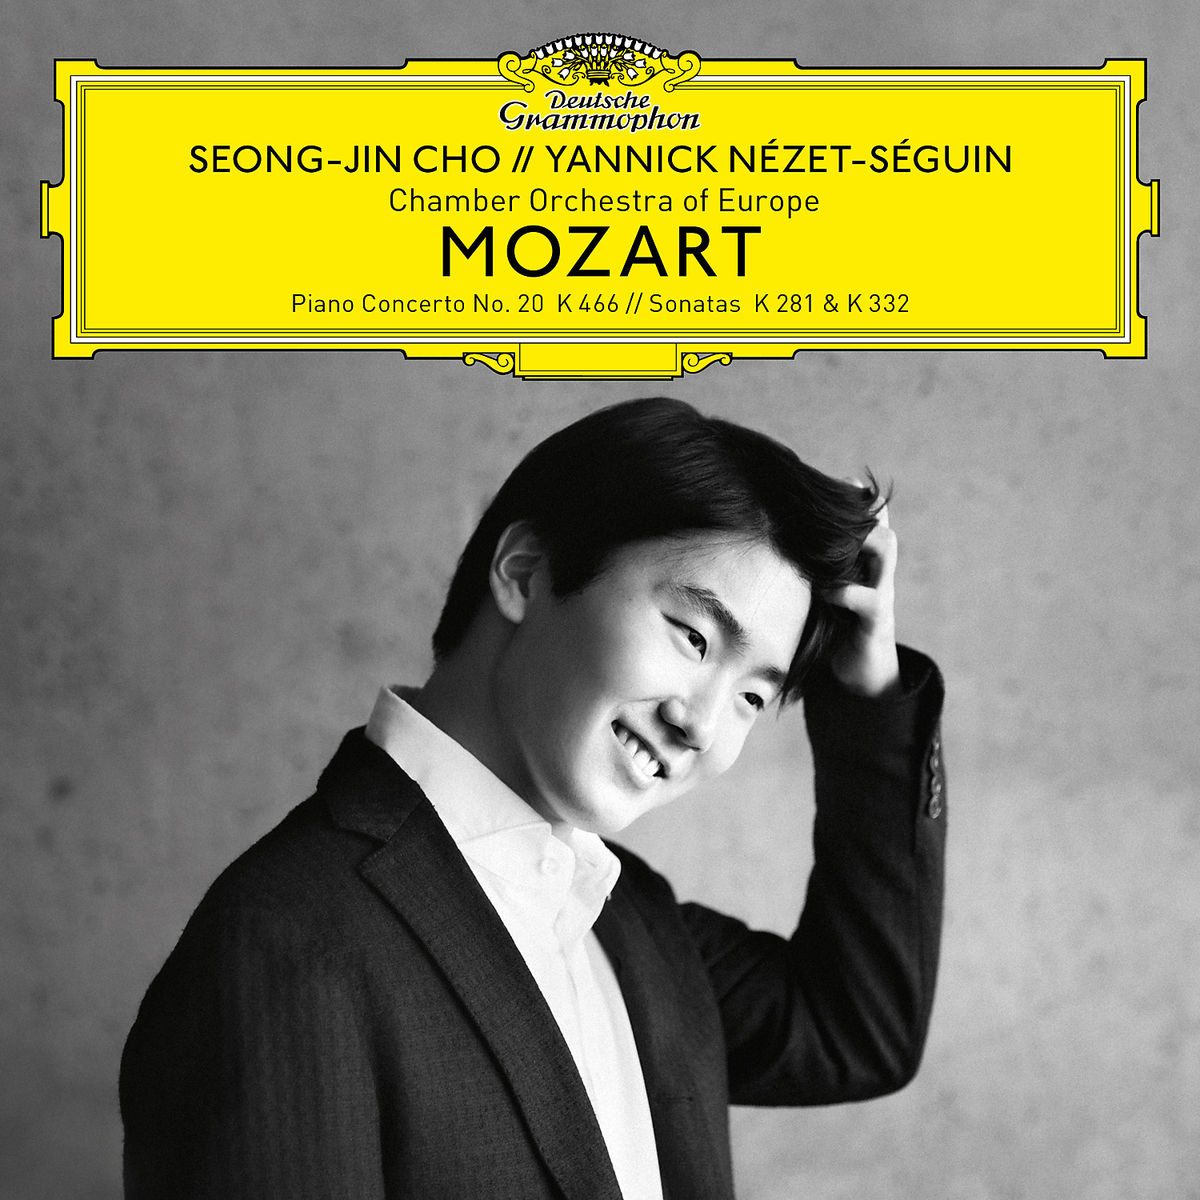 Produktfamilie | MOZART Piano Concerto No.20 + Sonatas / Cho